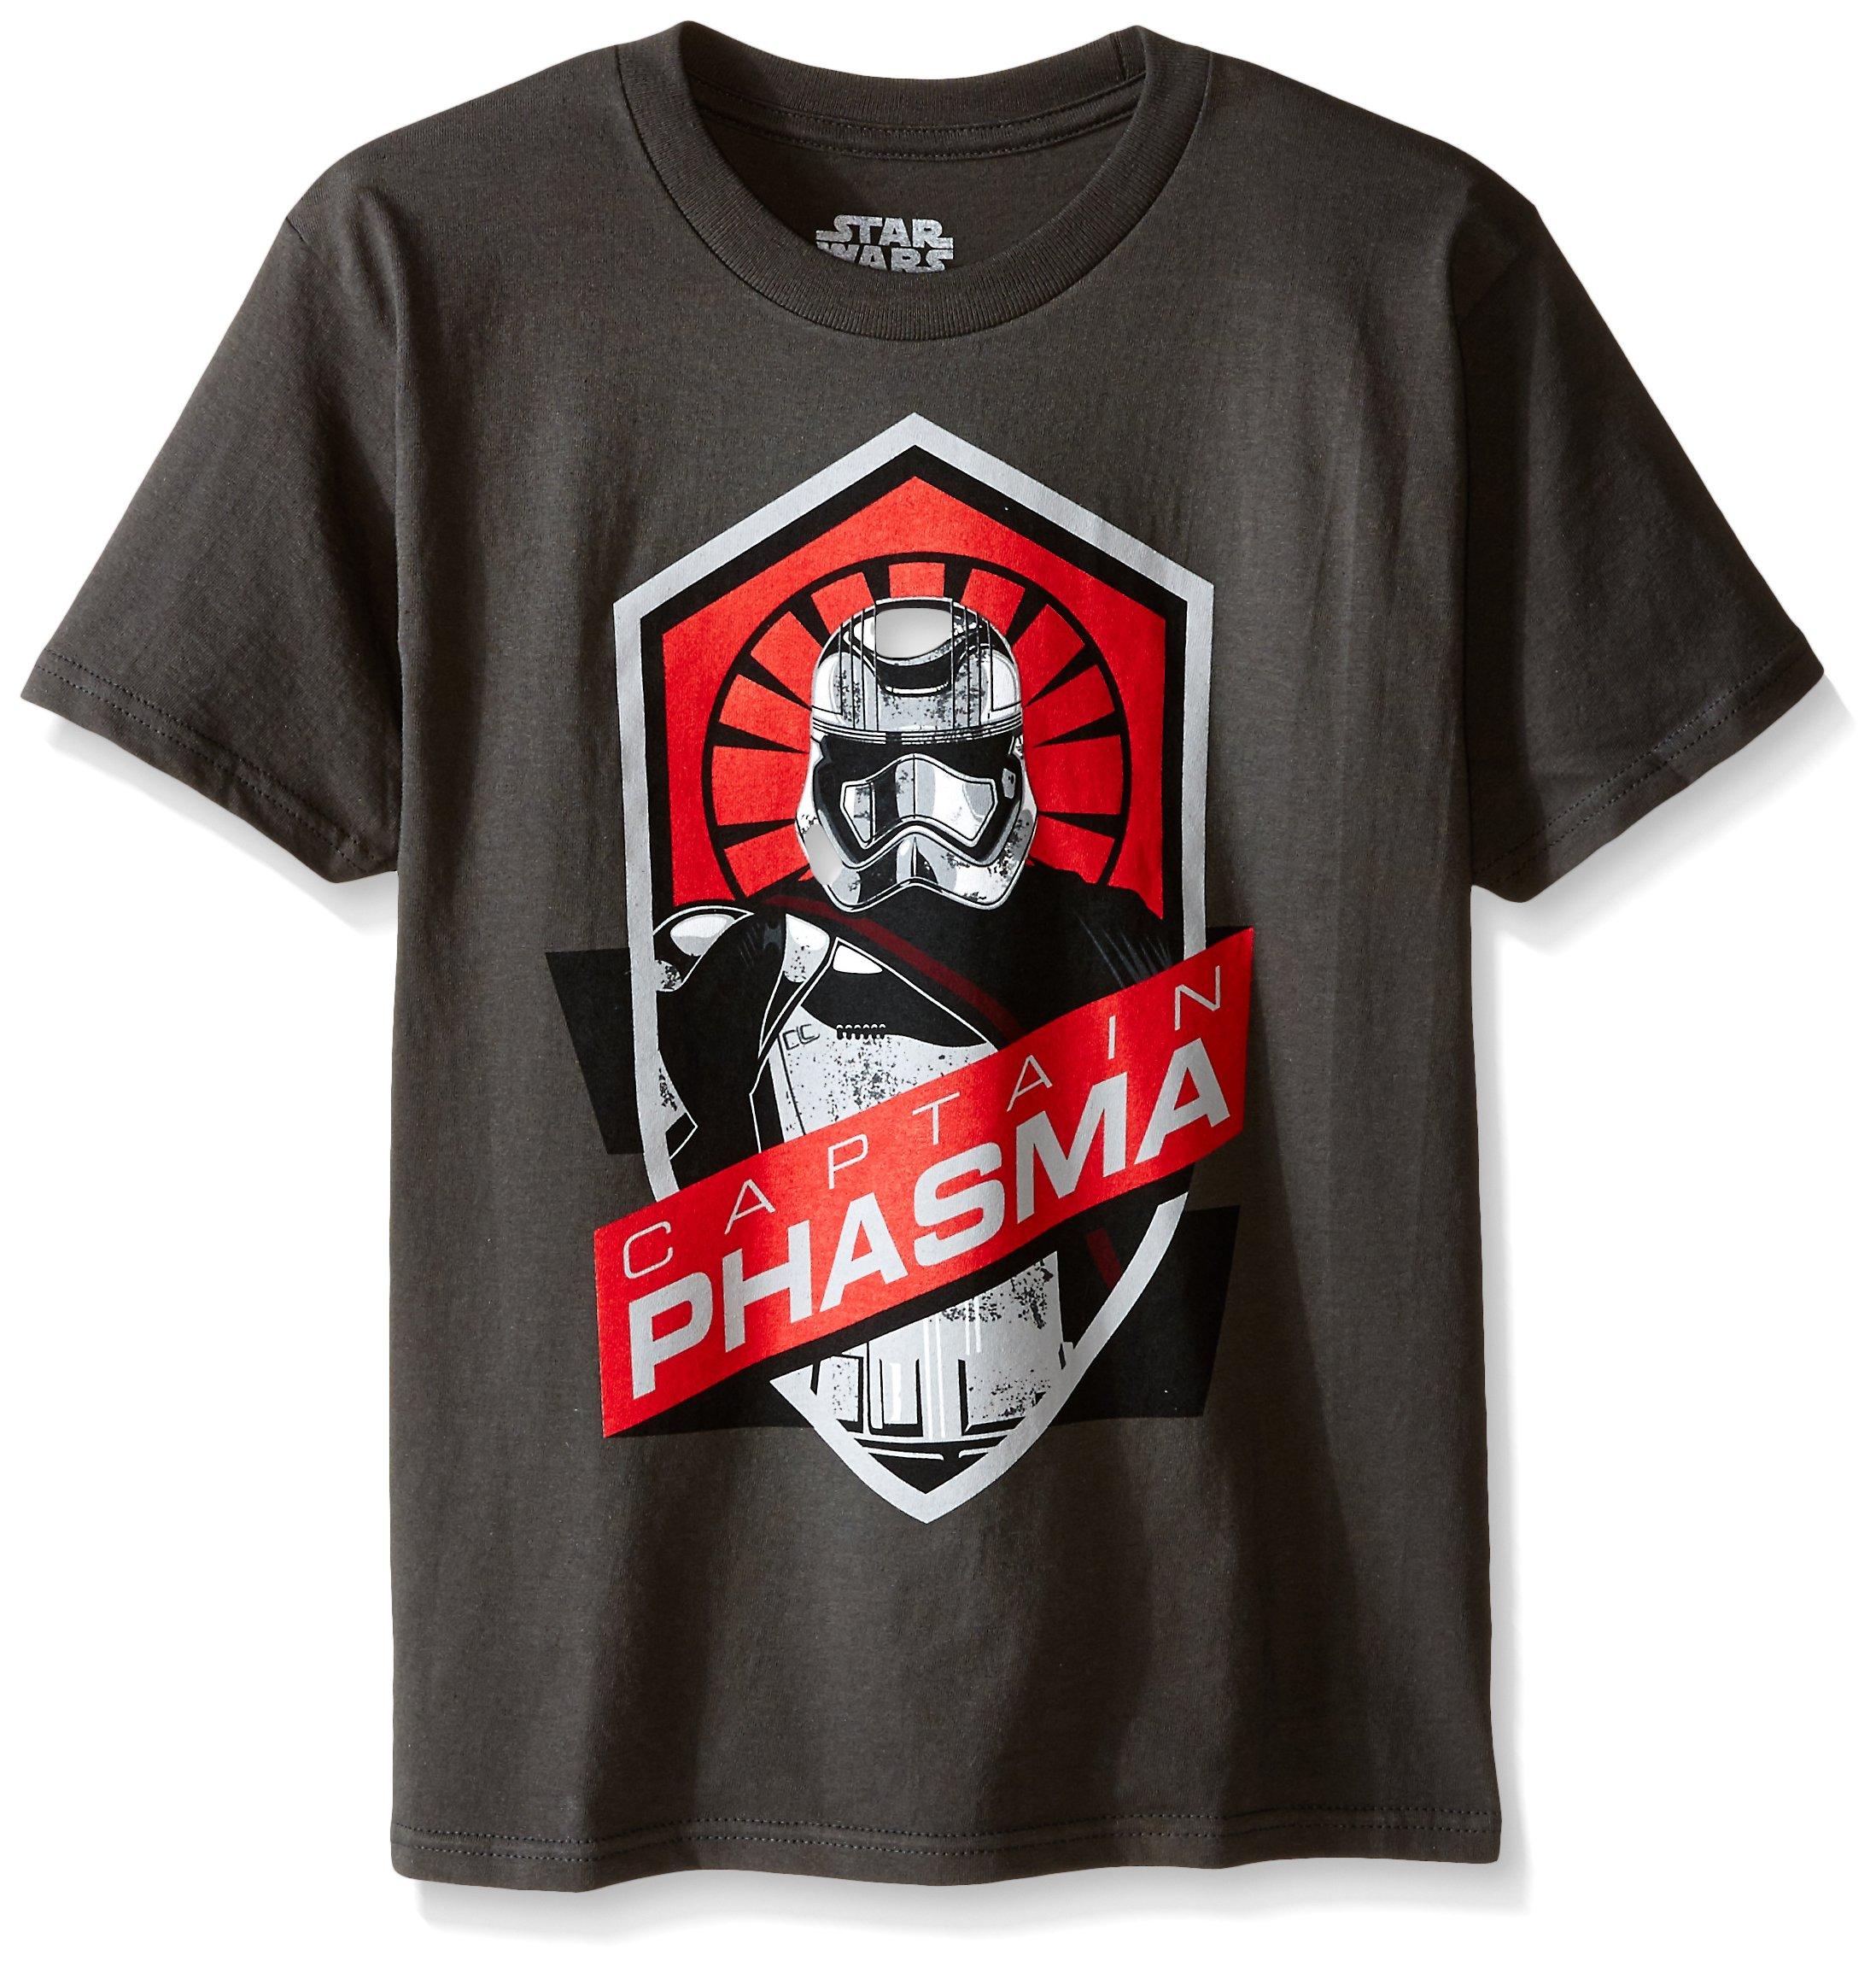 Star Wars Big Boys' Stormtrooper T-Shirt, Charcoal, Medium/10-12